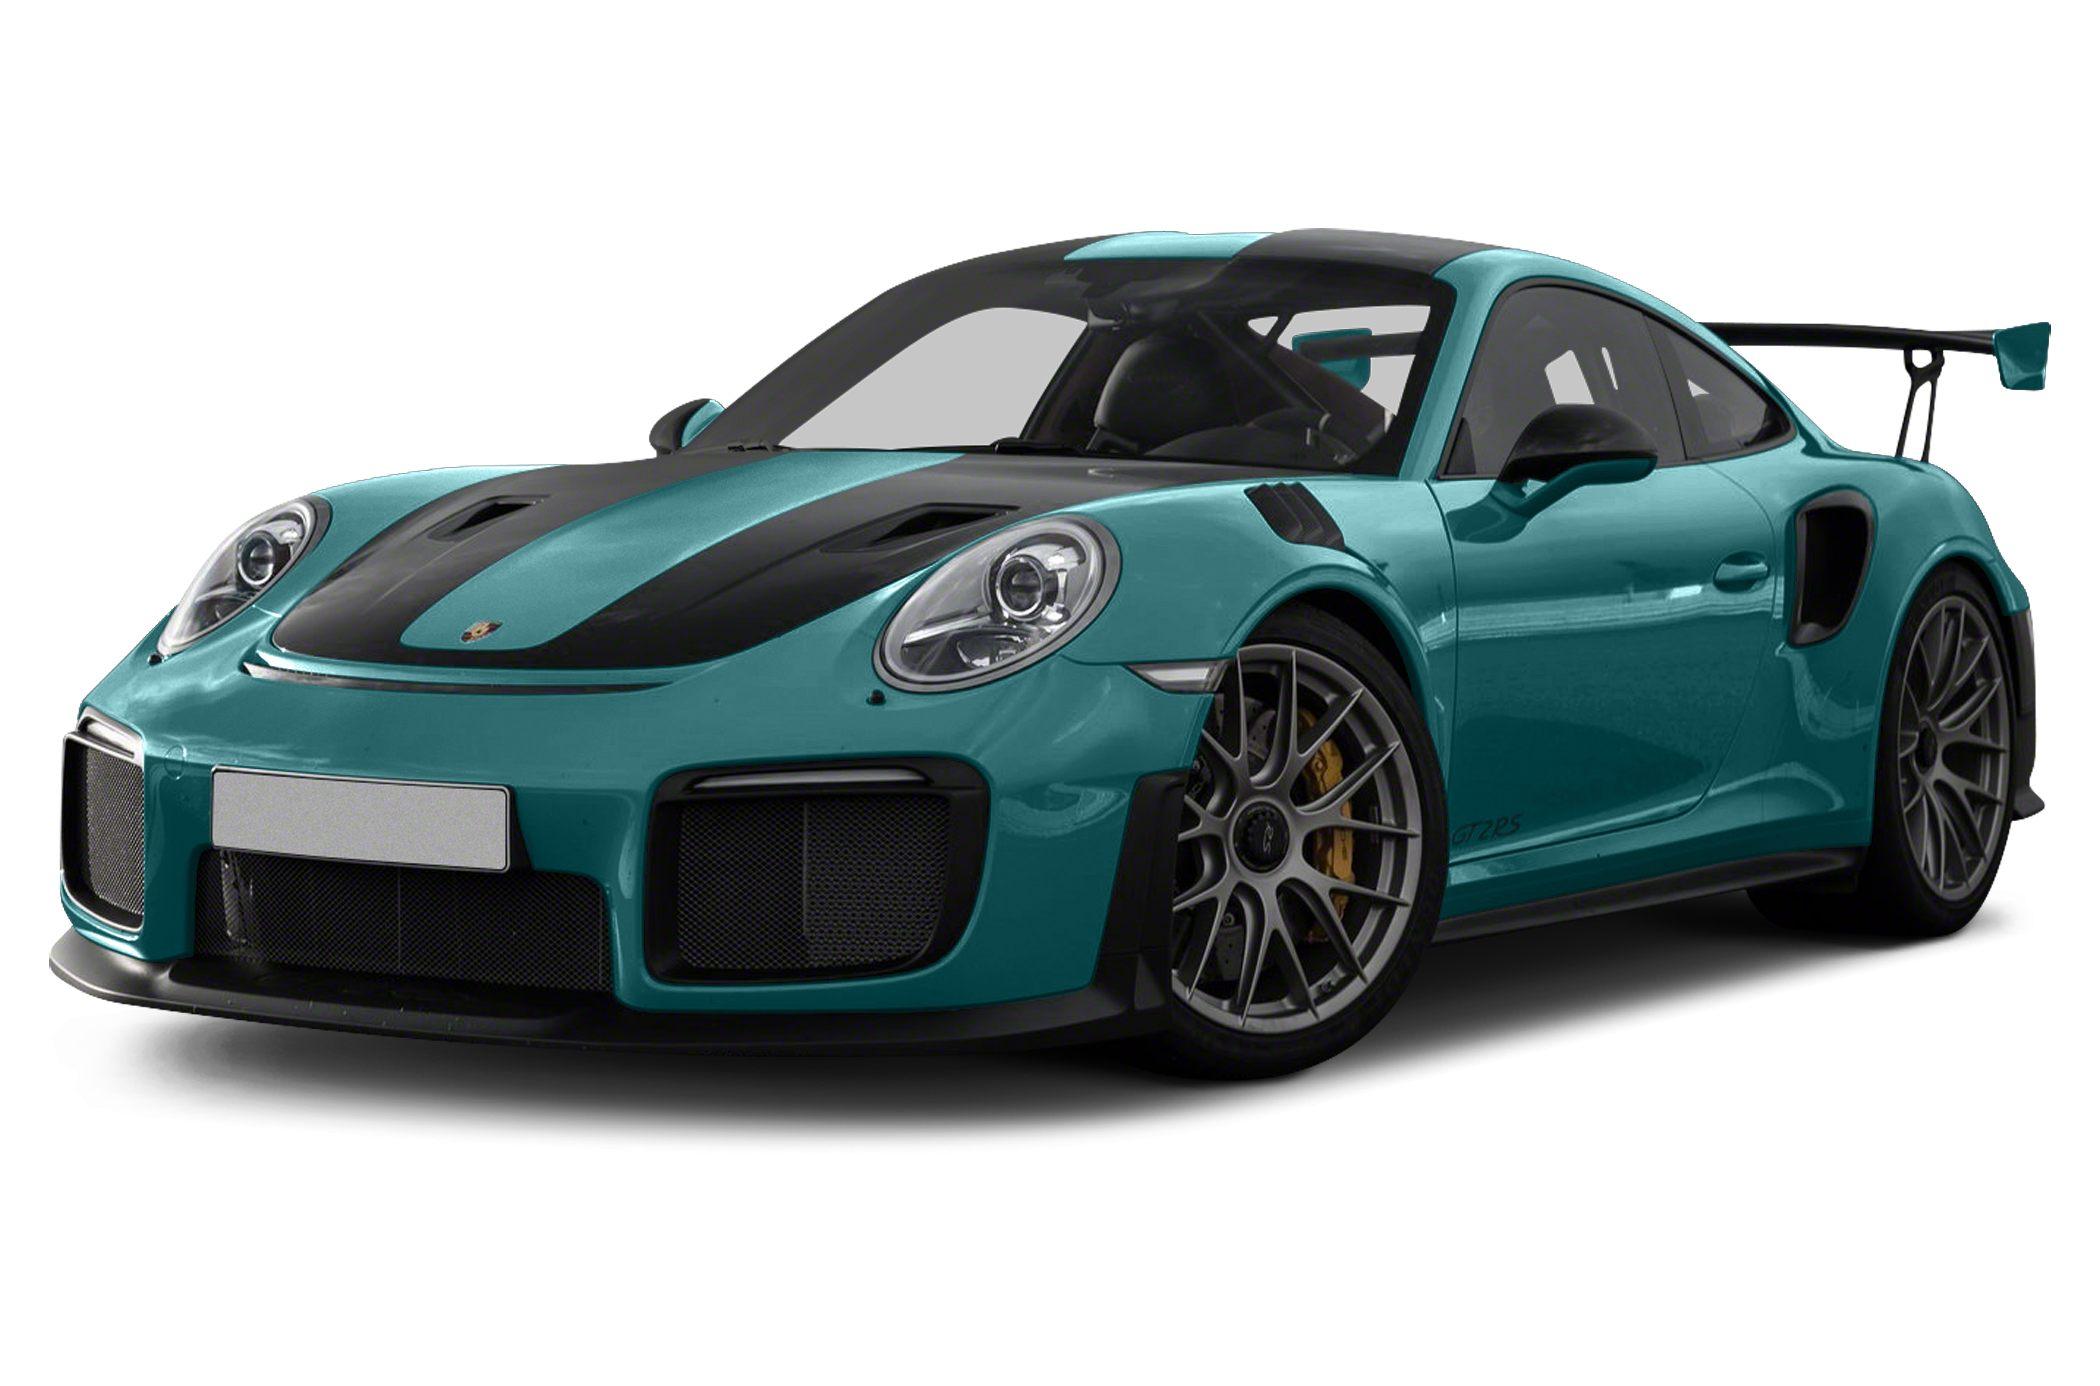 2018 Porsche 911 Gt2 Rs 2dr Rear Wheel Drive Coupe Pictures